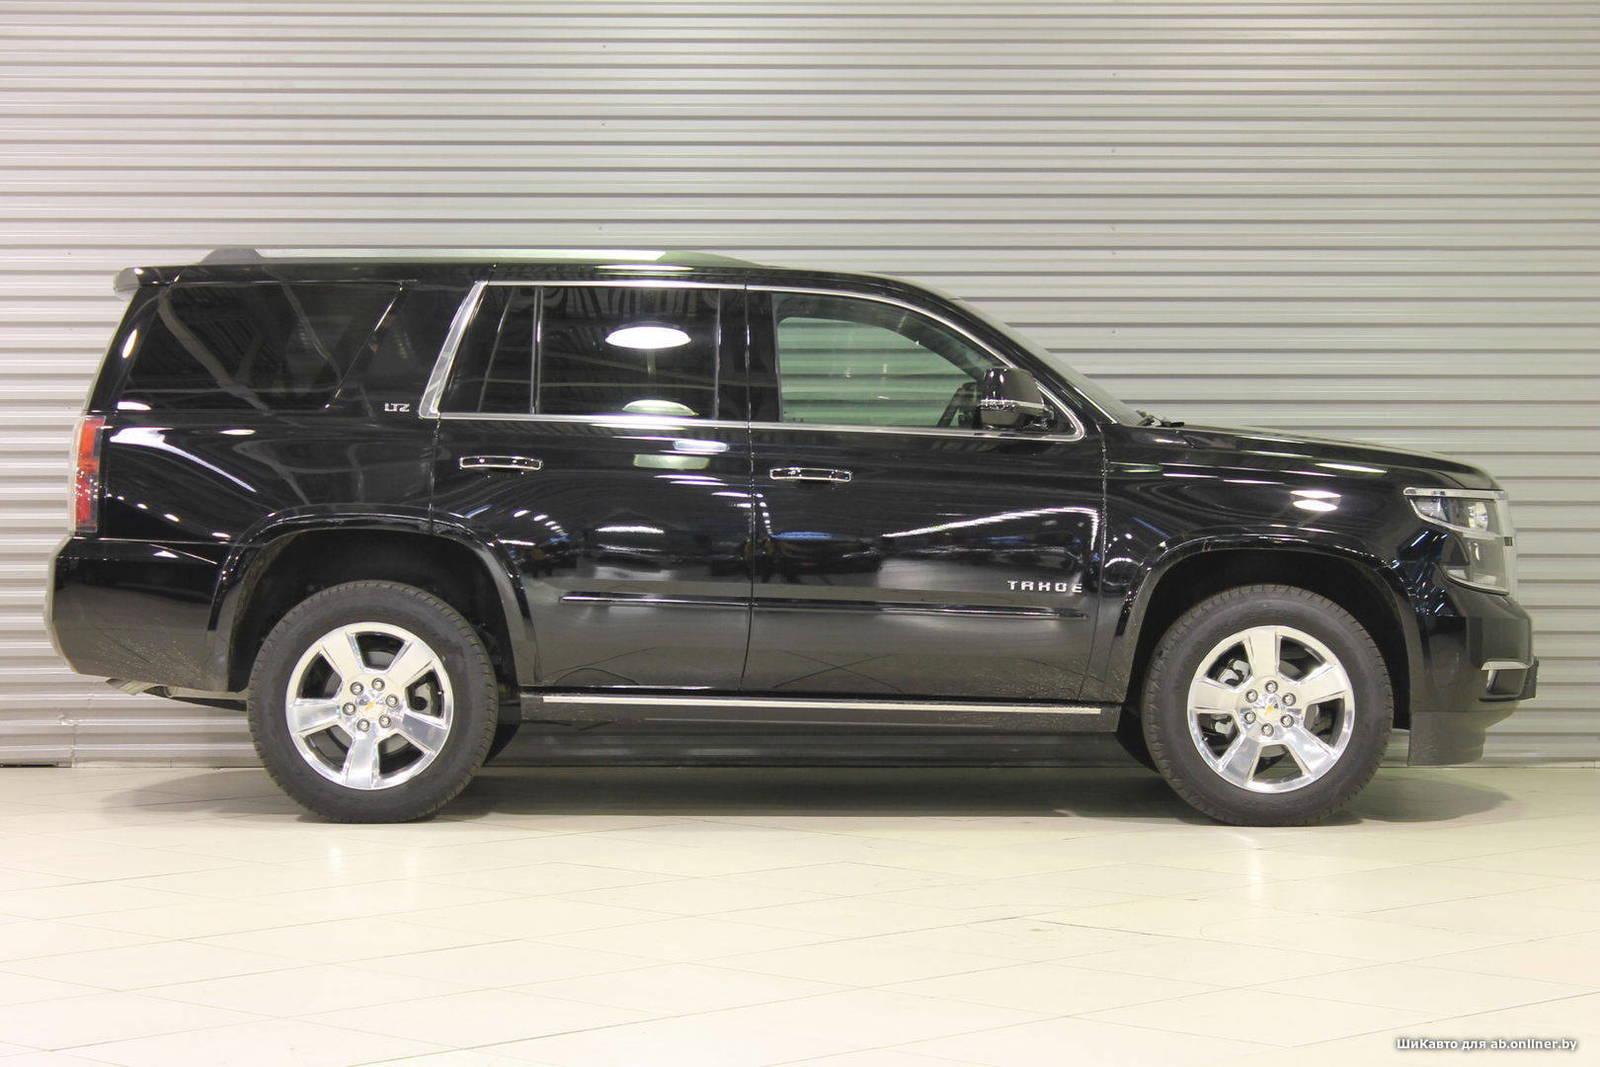 Chevrolet Tahoe 6.2 LTZ